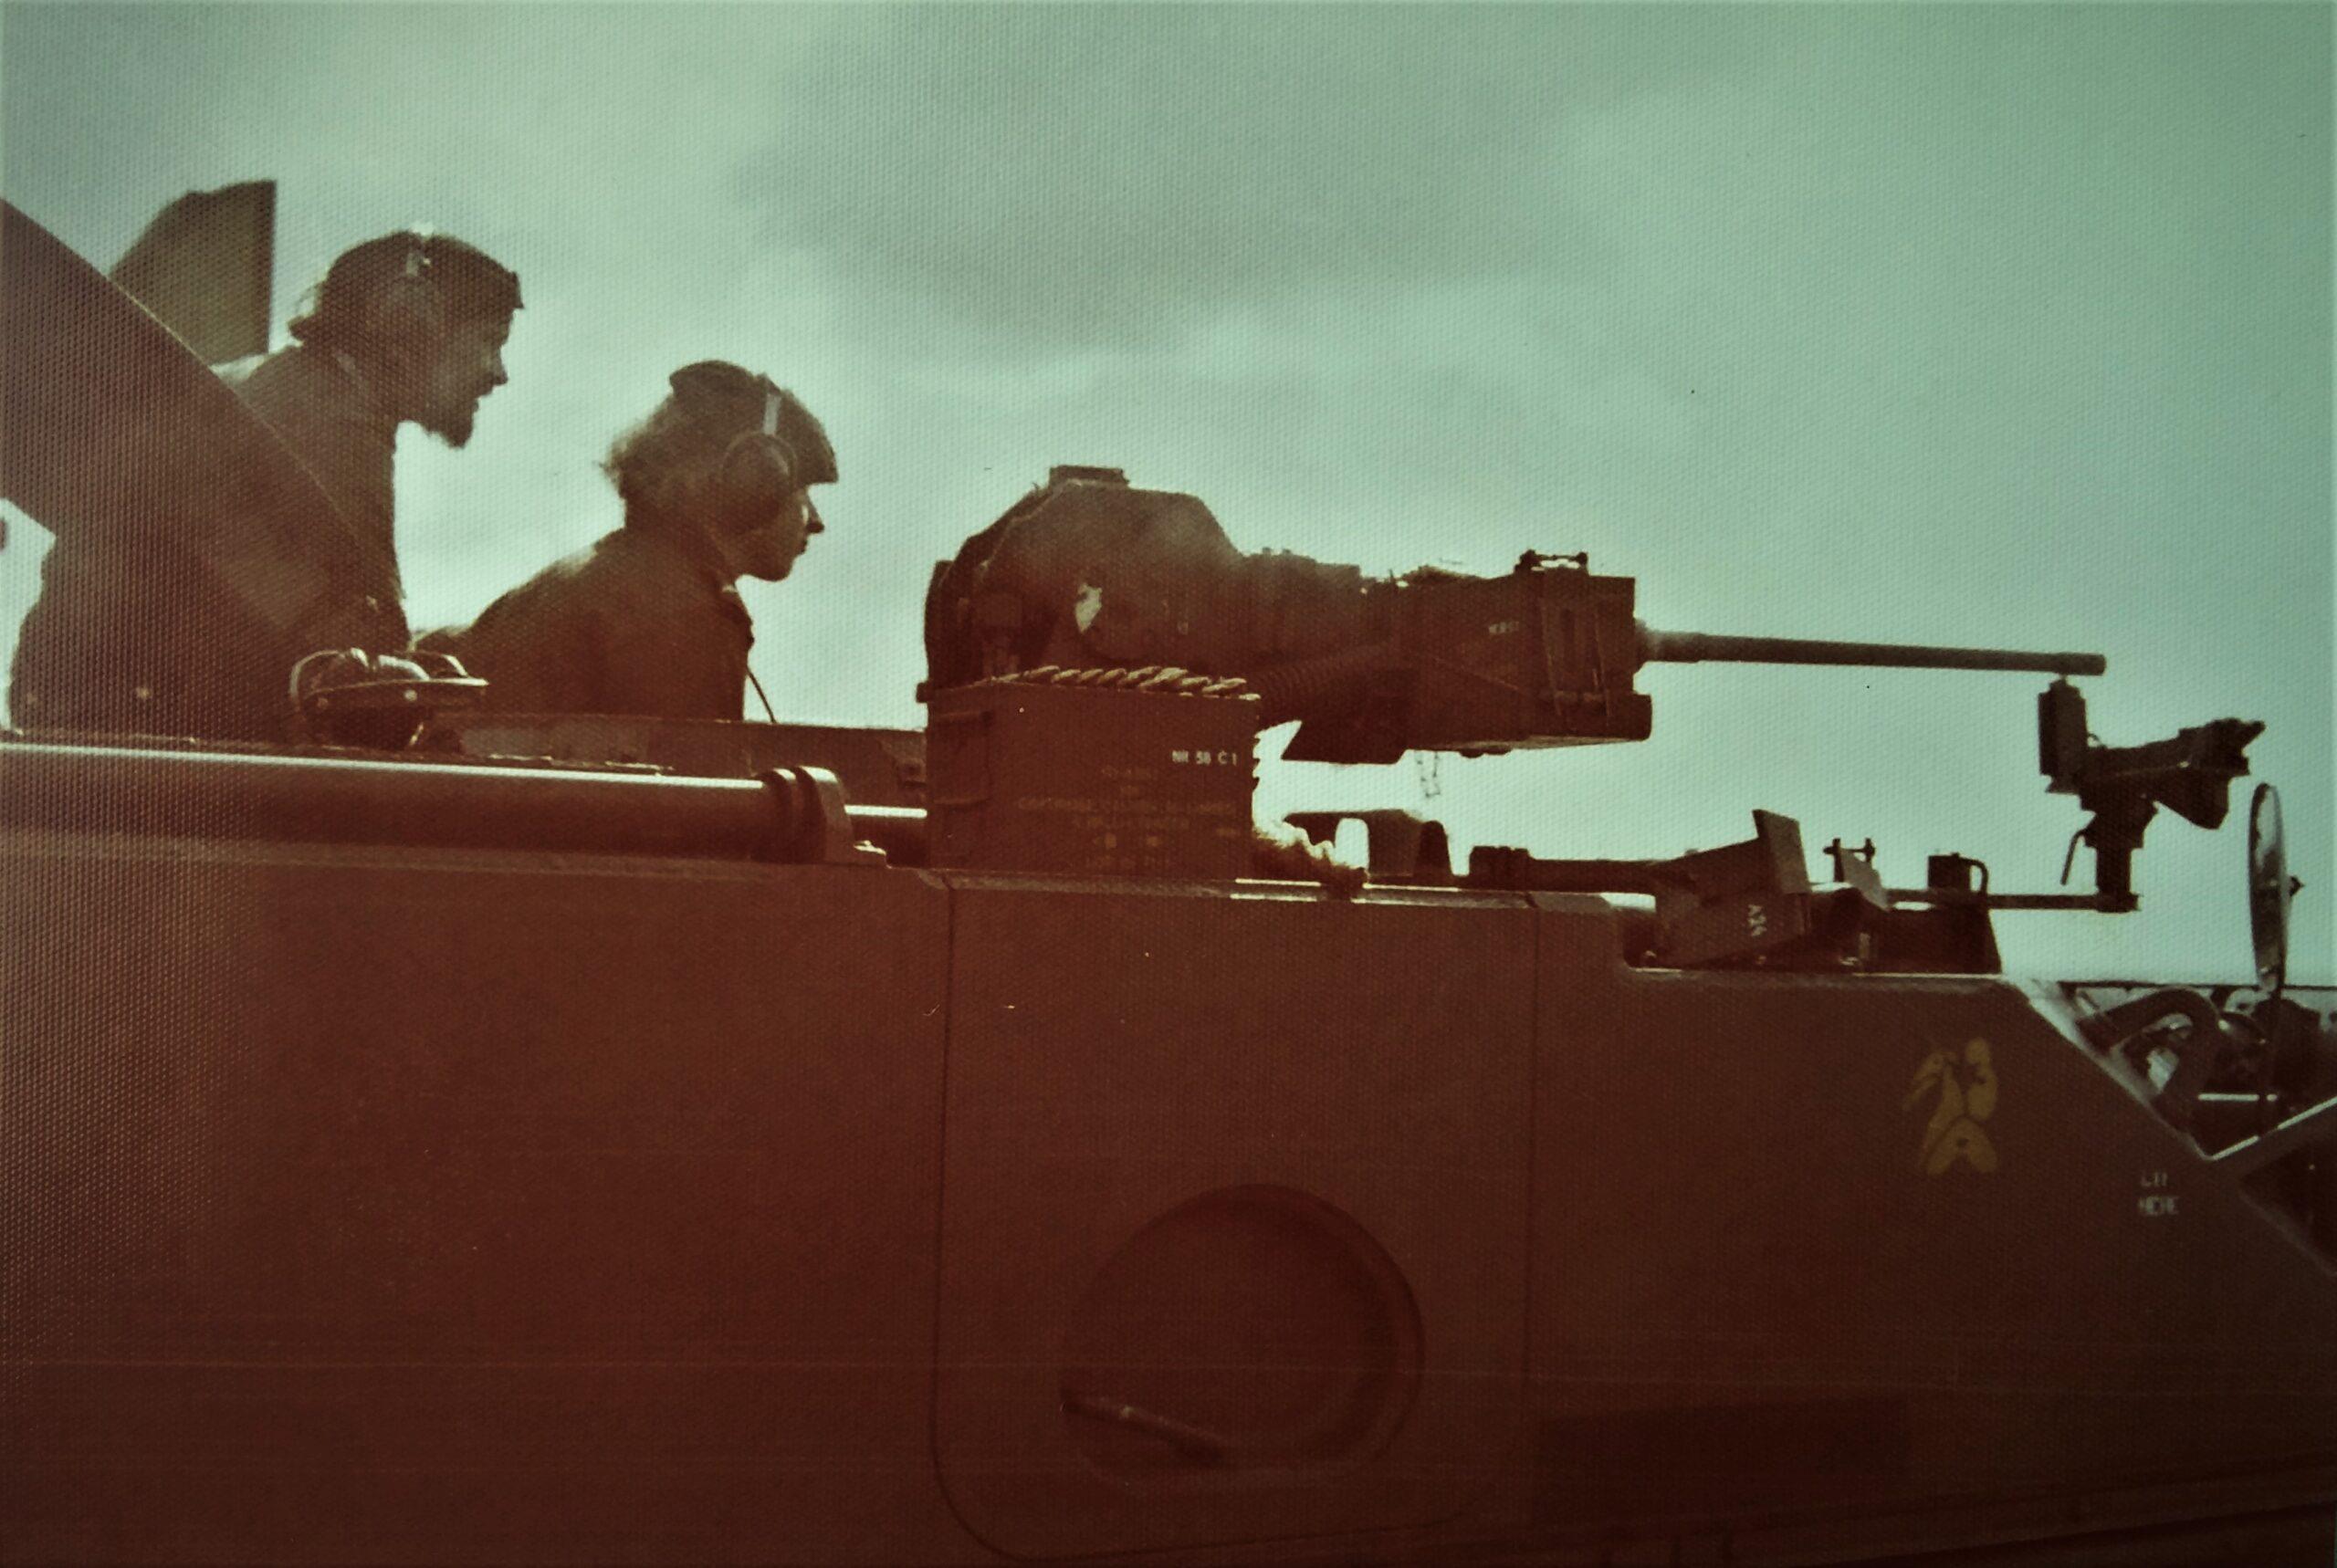 1974 09 A Esk 103 Verkbat Schietserie M113 CR .50 Inz. Harry de Groot